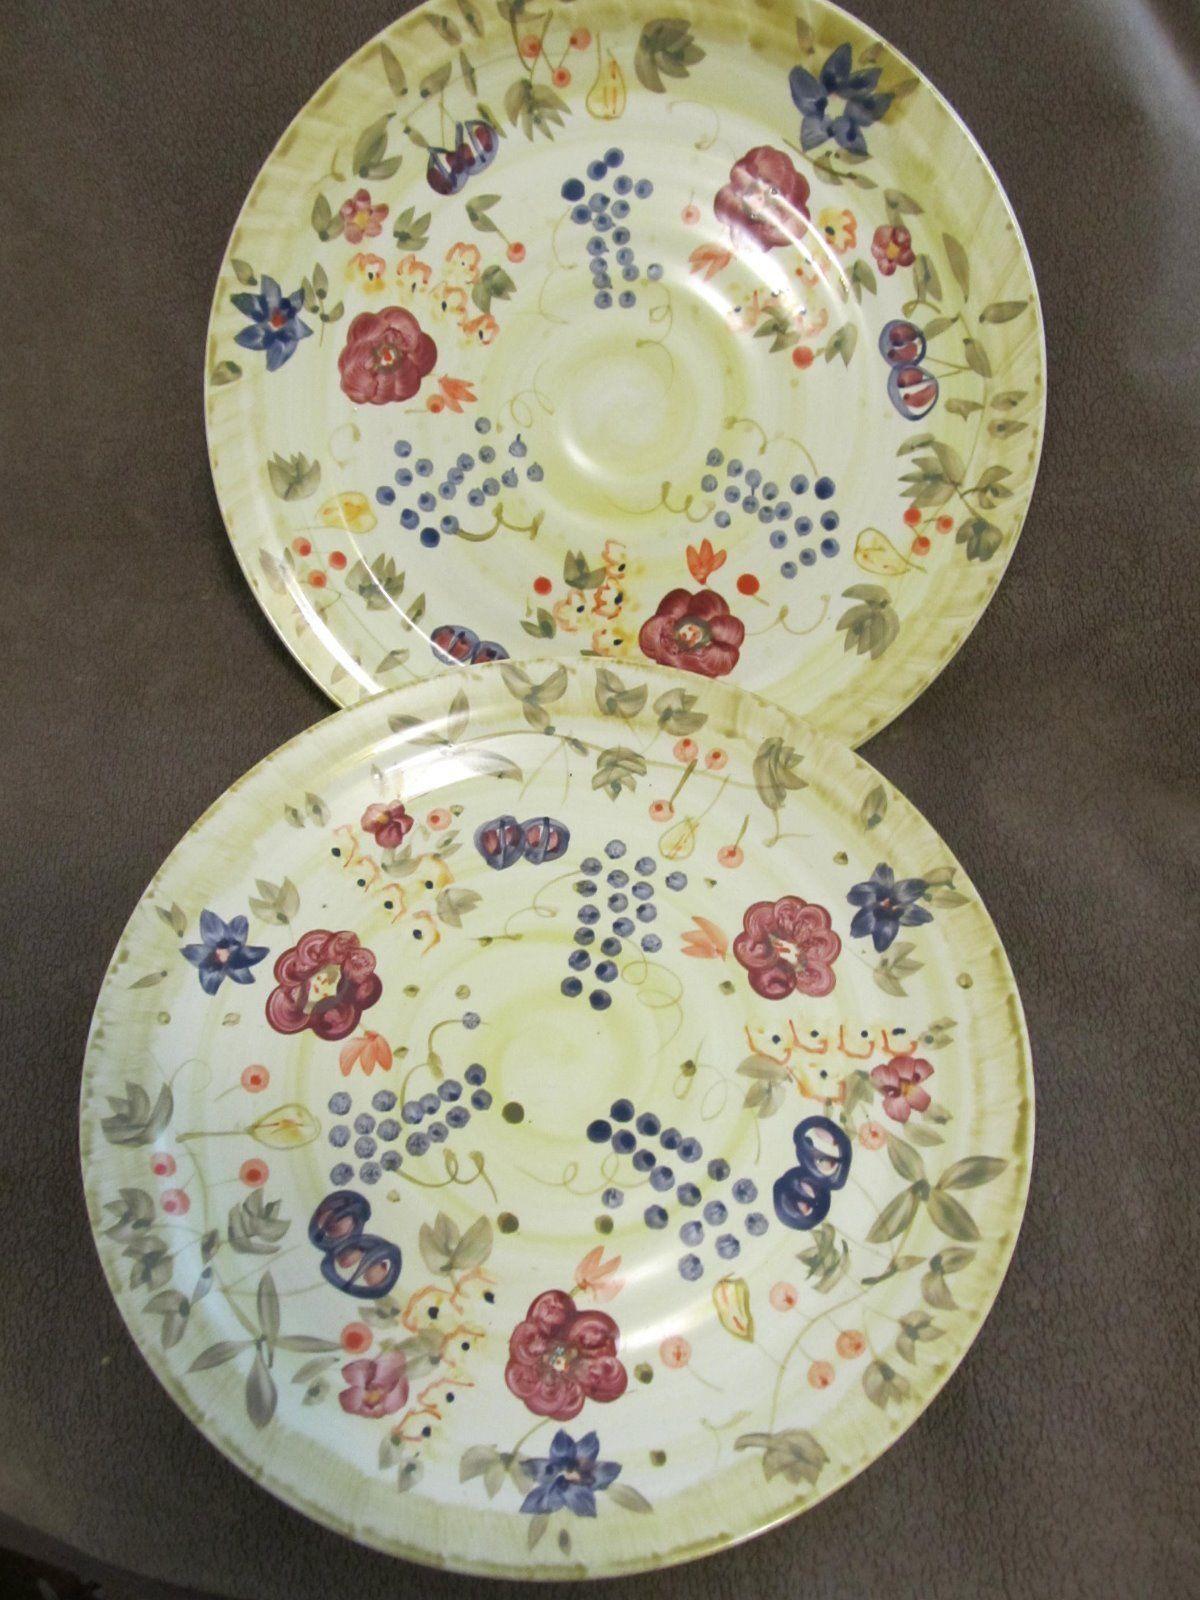 Alco Industries cranbury nj floral Dinner Plates made in china & Alco Industries cranbury nj floral Dinner Plates 11\